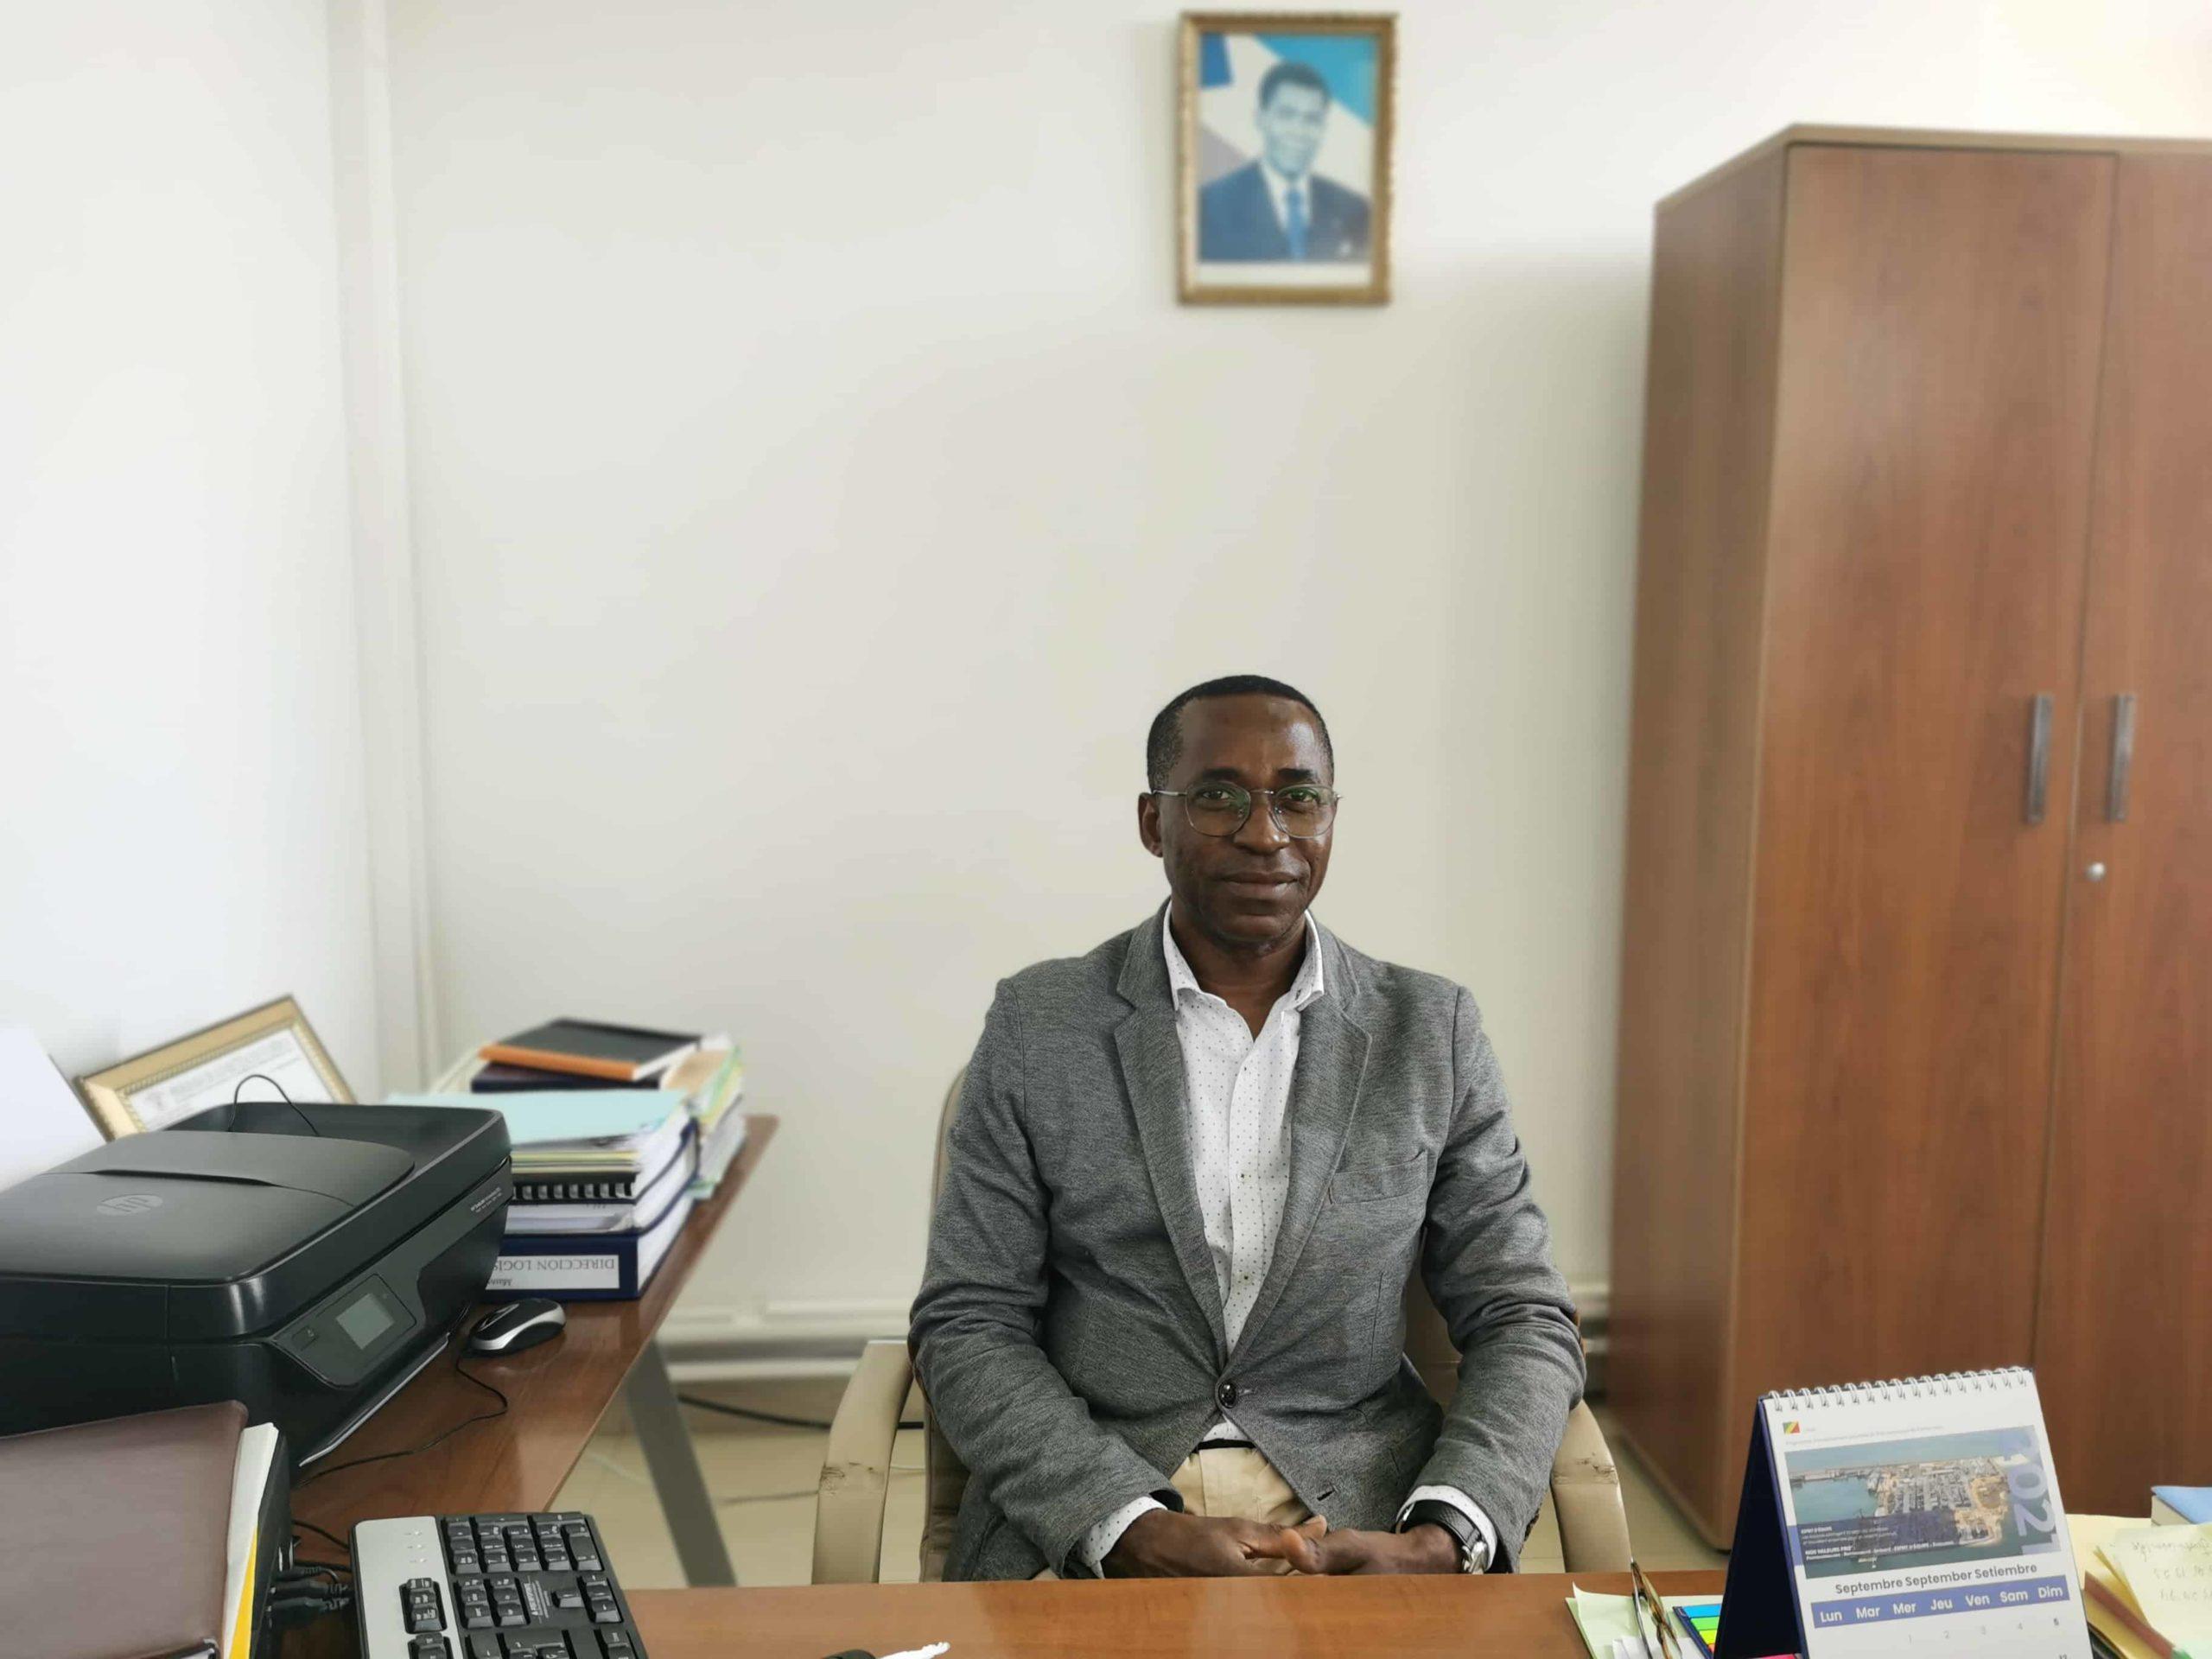 Paulino José Menejal Pelayo Director General de INPYDE